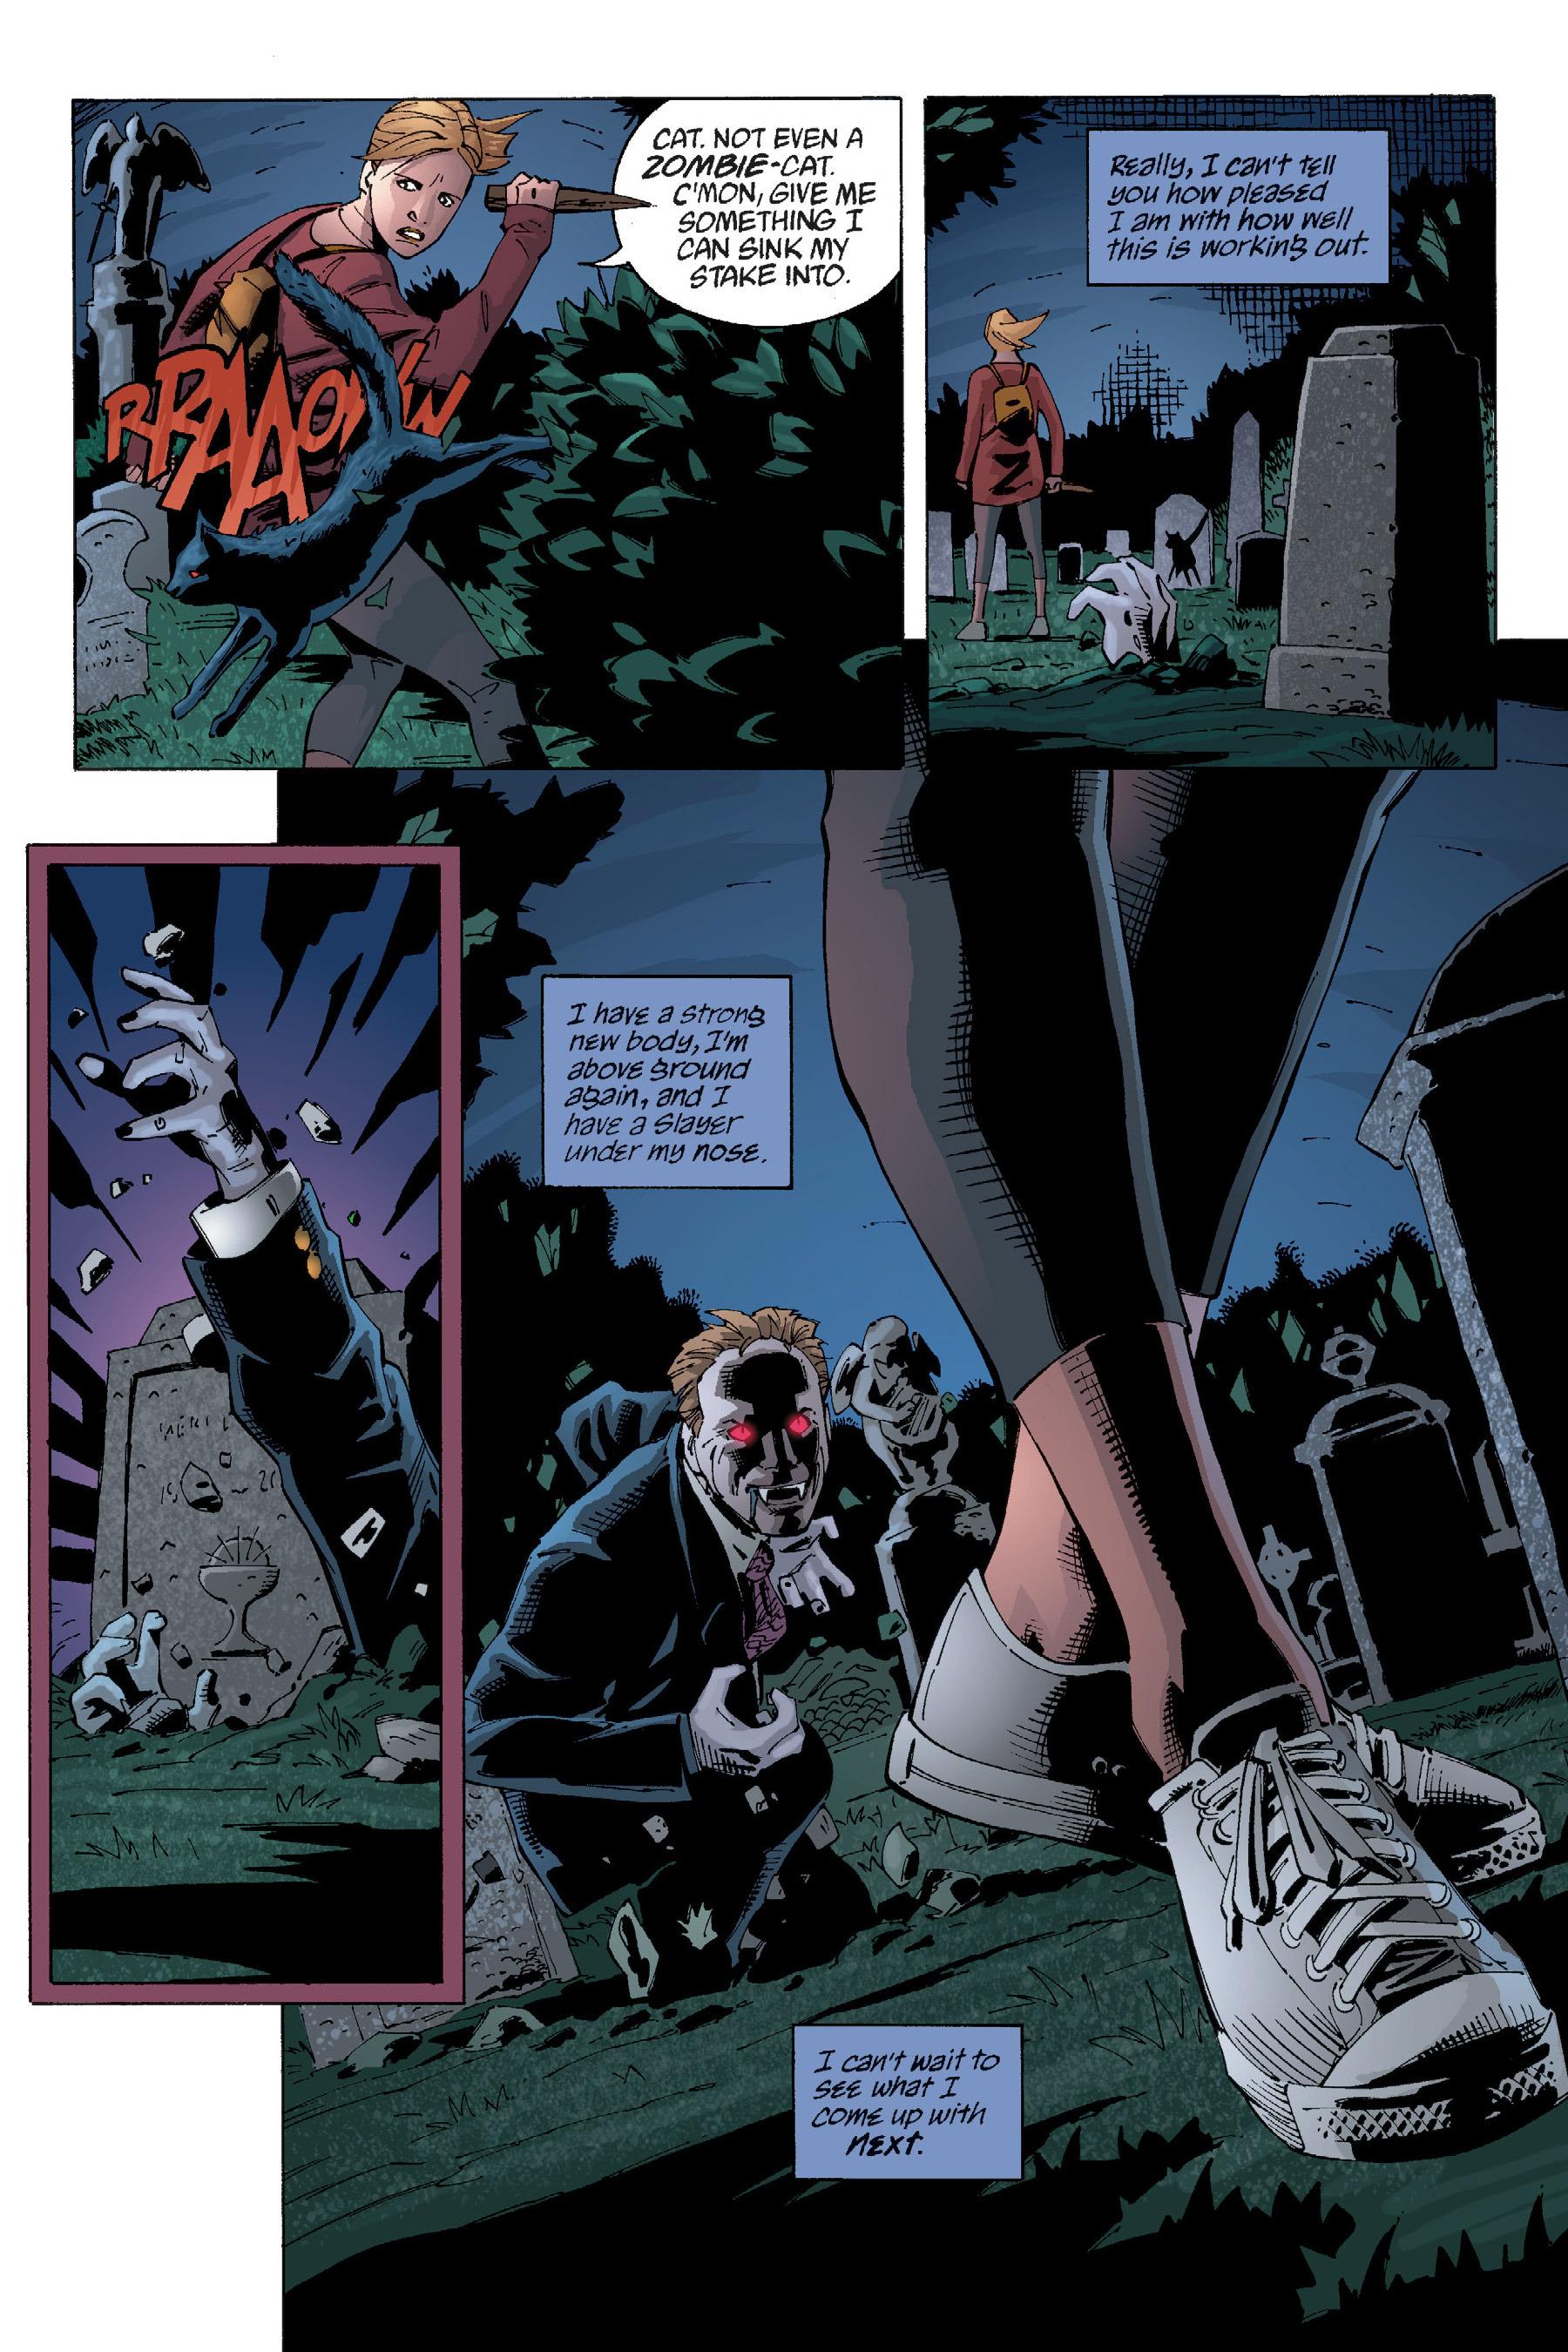 Read online Buffy the Vampire Slayer: Omnibus comic -  Issue # TPB 5 - 31